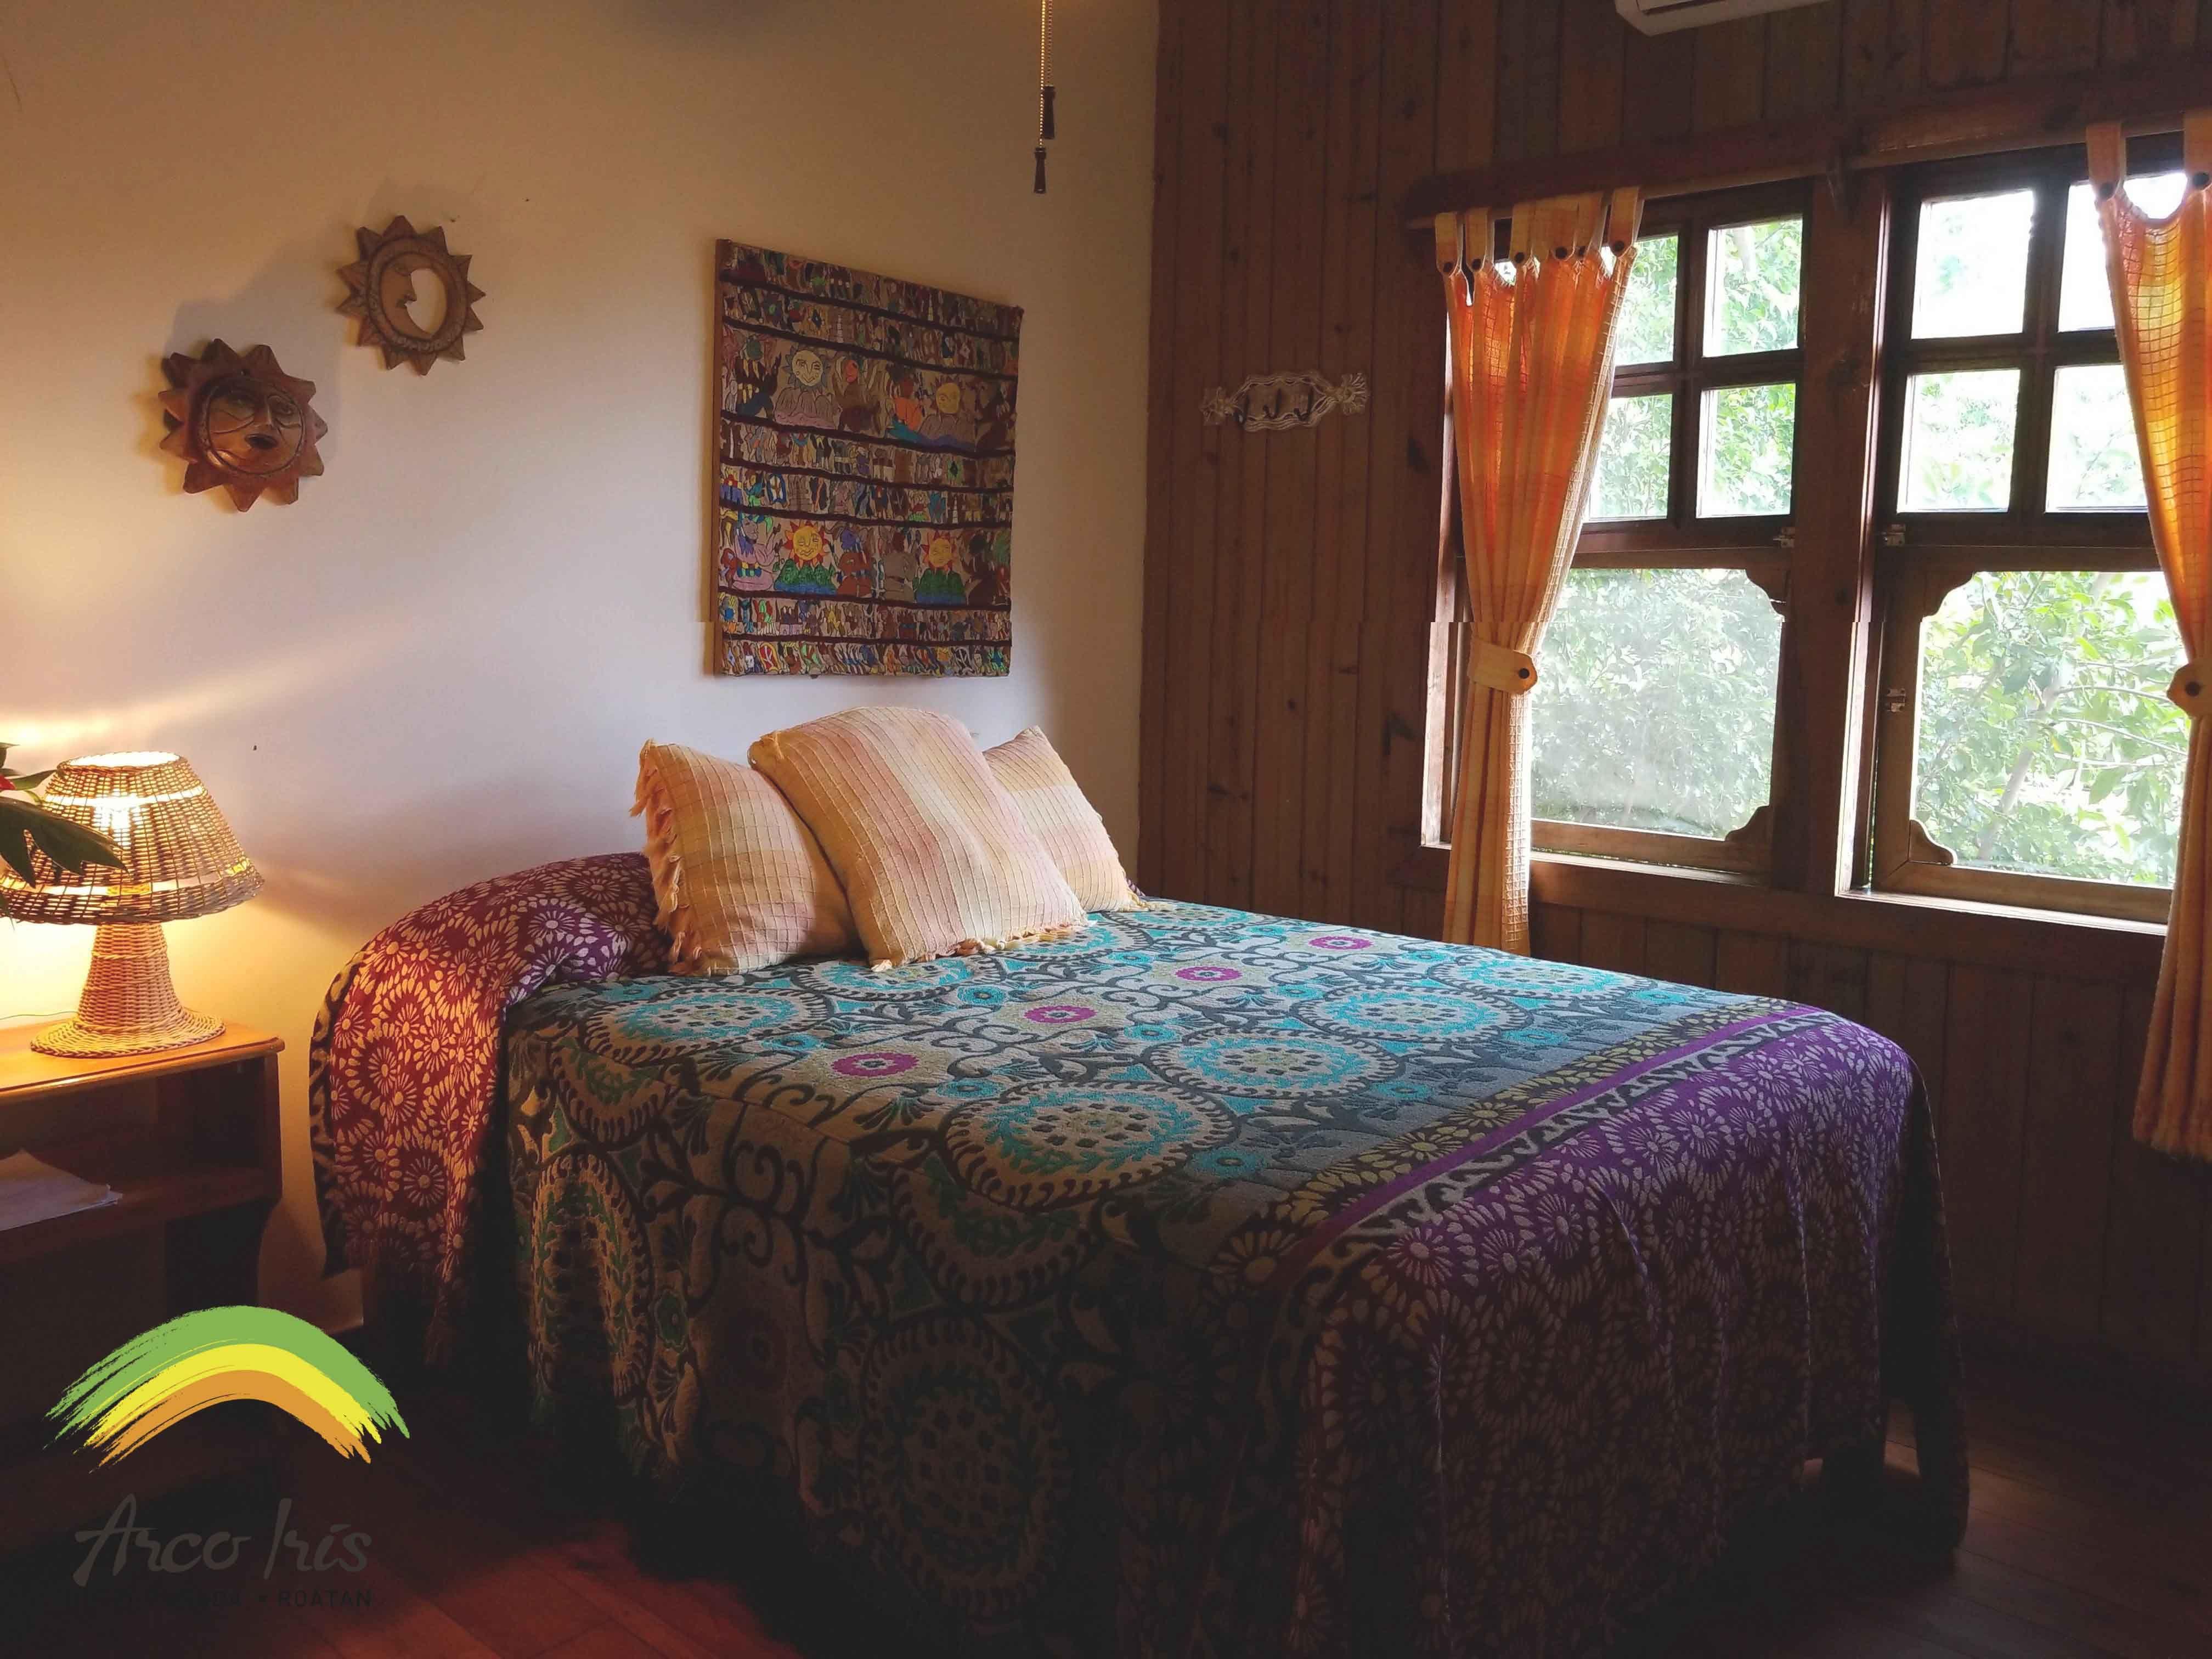 Hotel posado arco iris one of the best roatan honduras hotels is